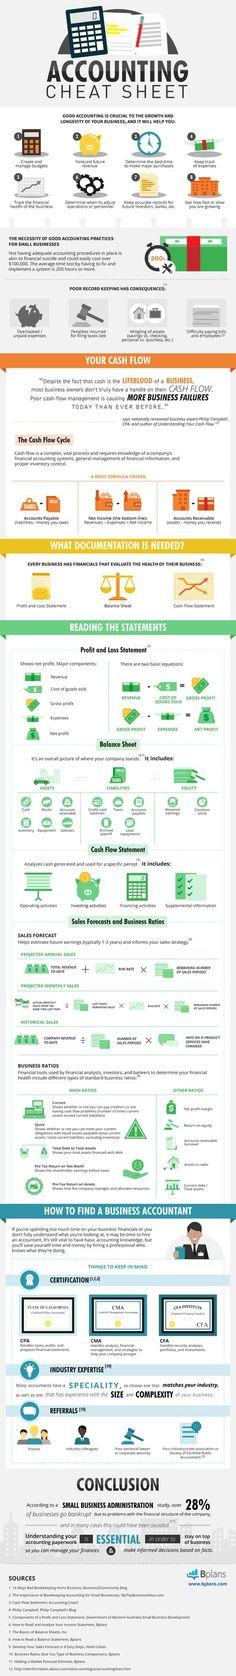 Accounting-Basics-Cheat-Sheet